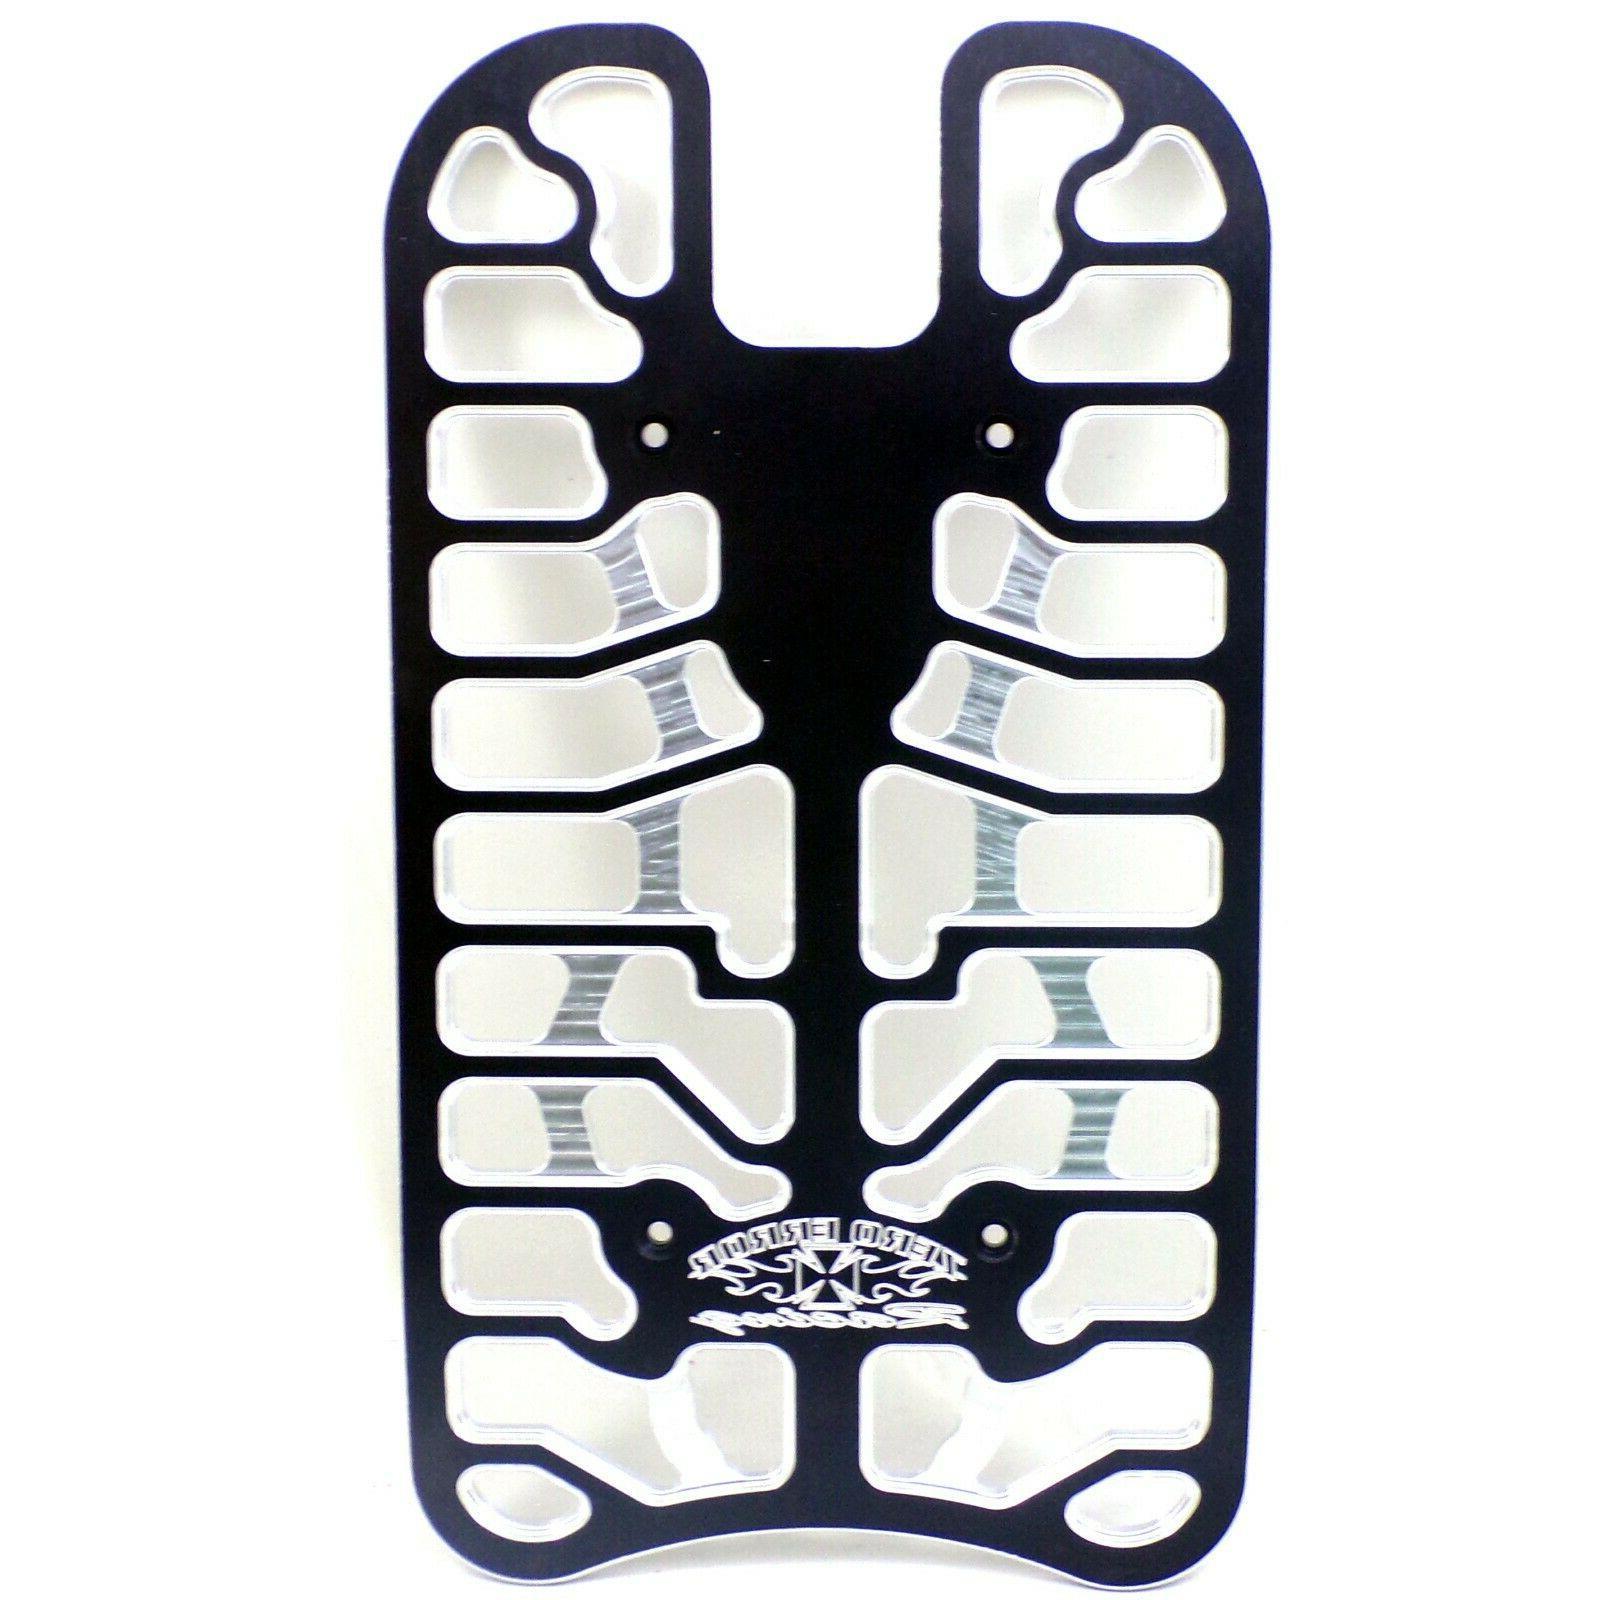 Goped Bigfoot GSR Pro Deck